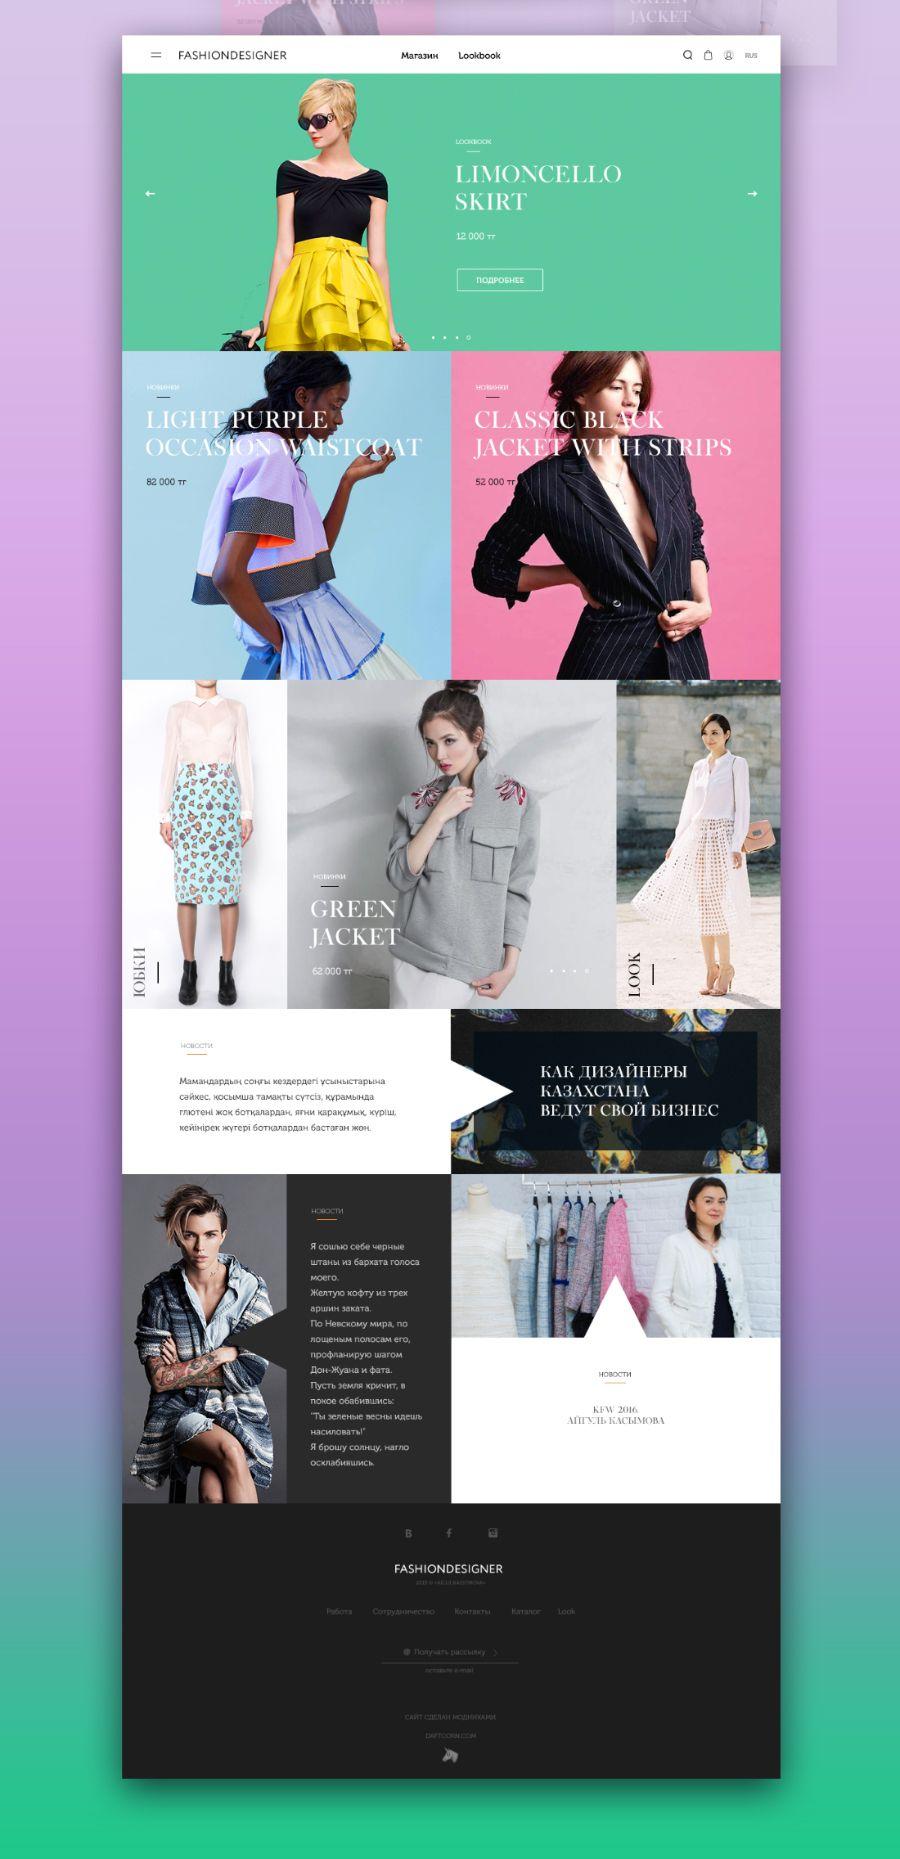 Fashion Shop Free PSD Template | Pinterest | Psd templates, Template ...